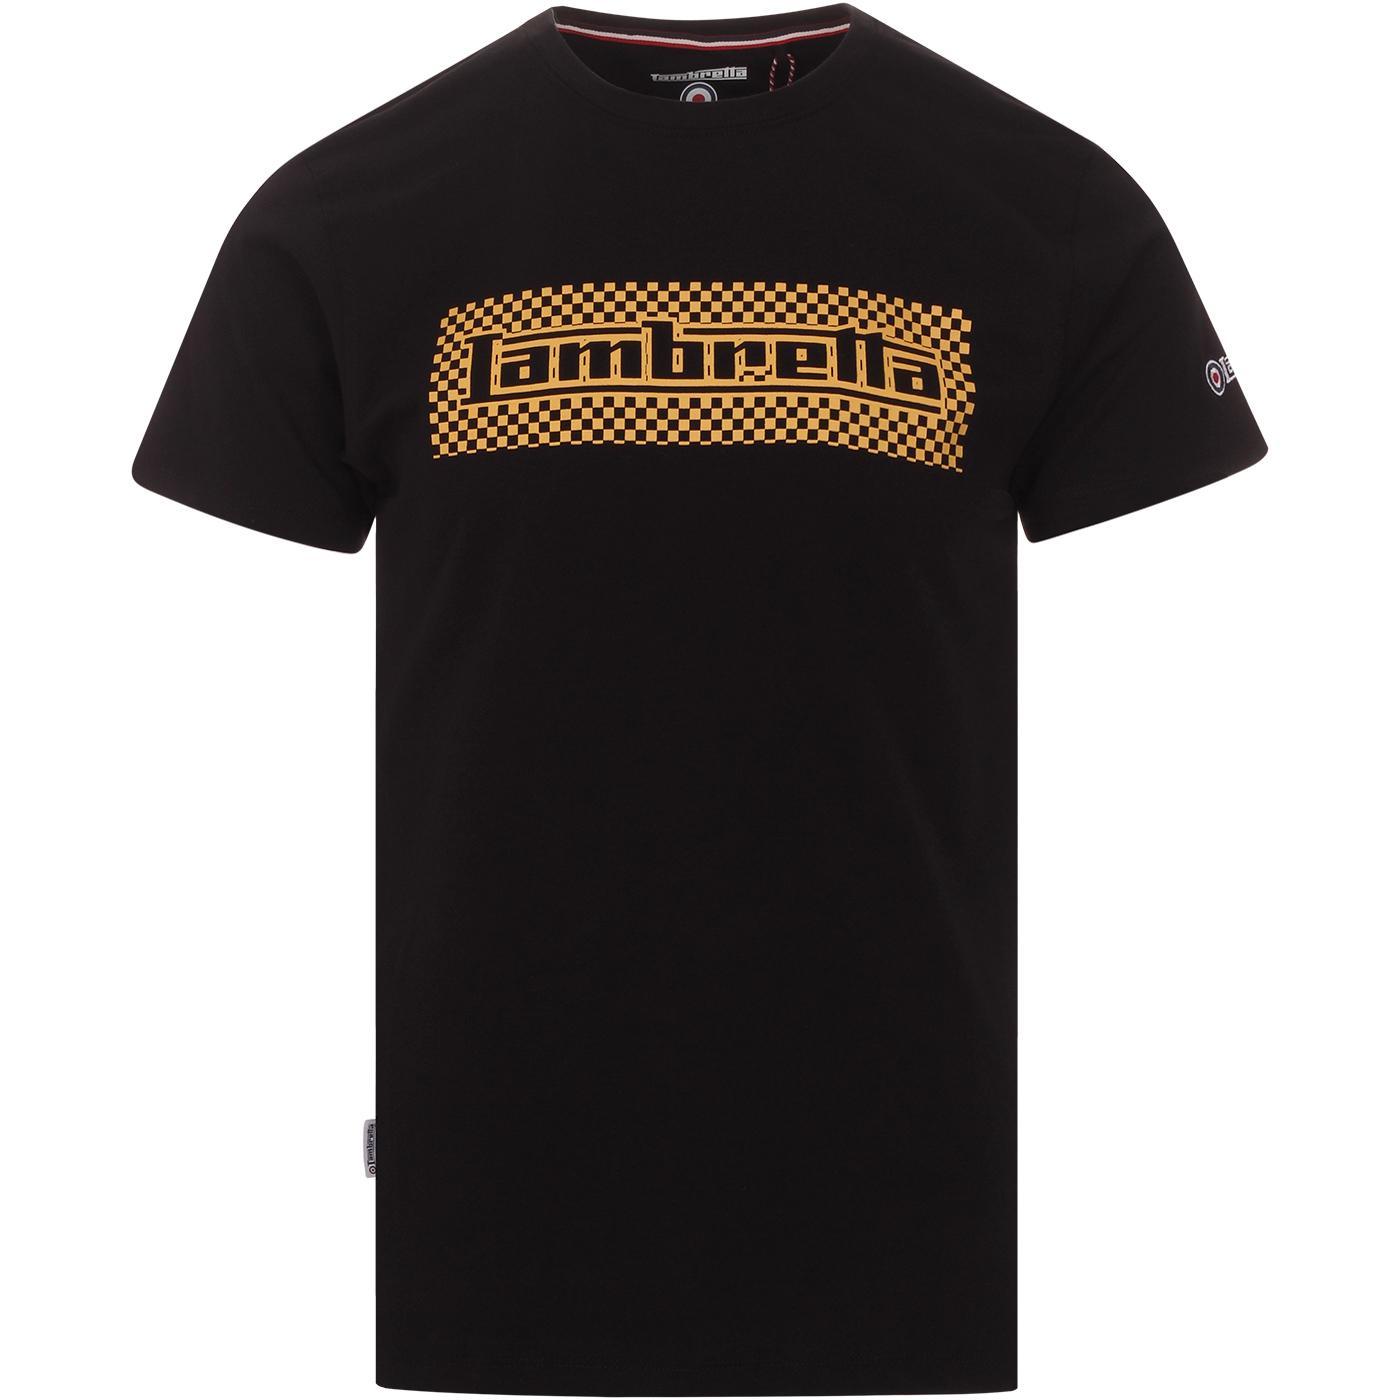 LAMBRETTA Mod Ska Checkerboard T-shirt (Black)